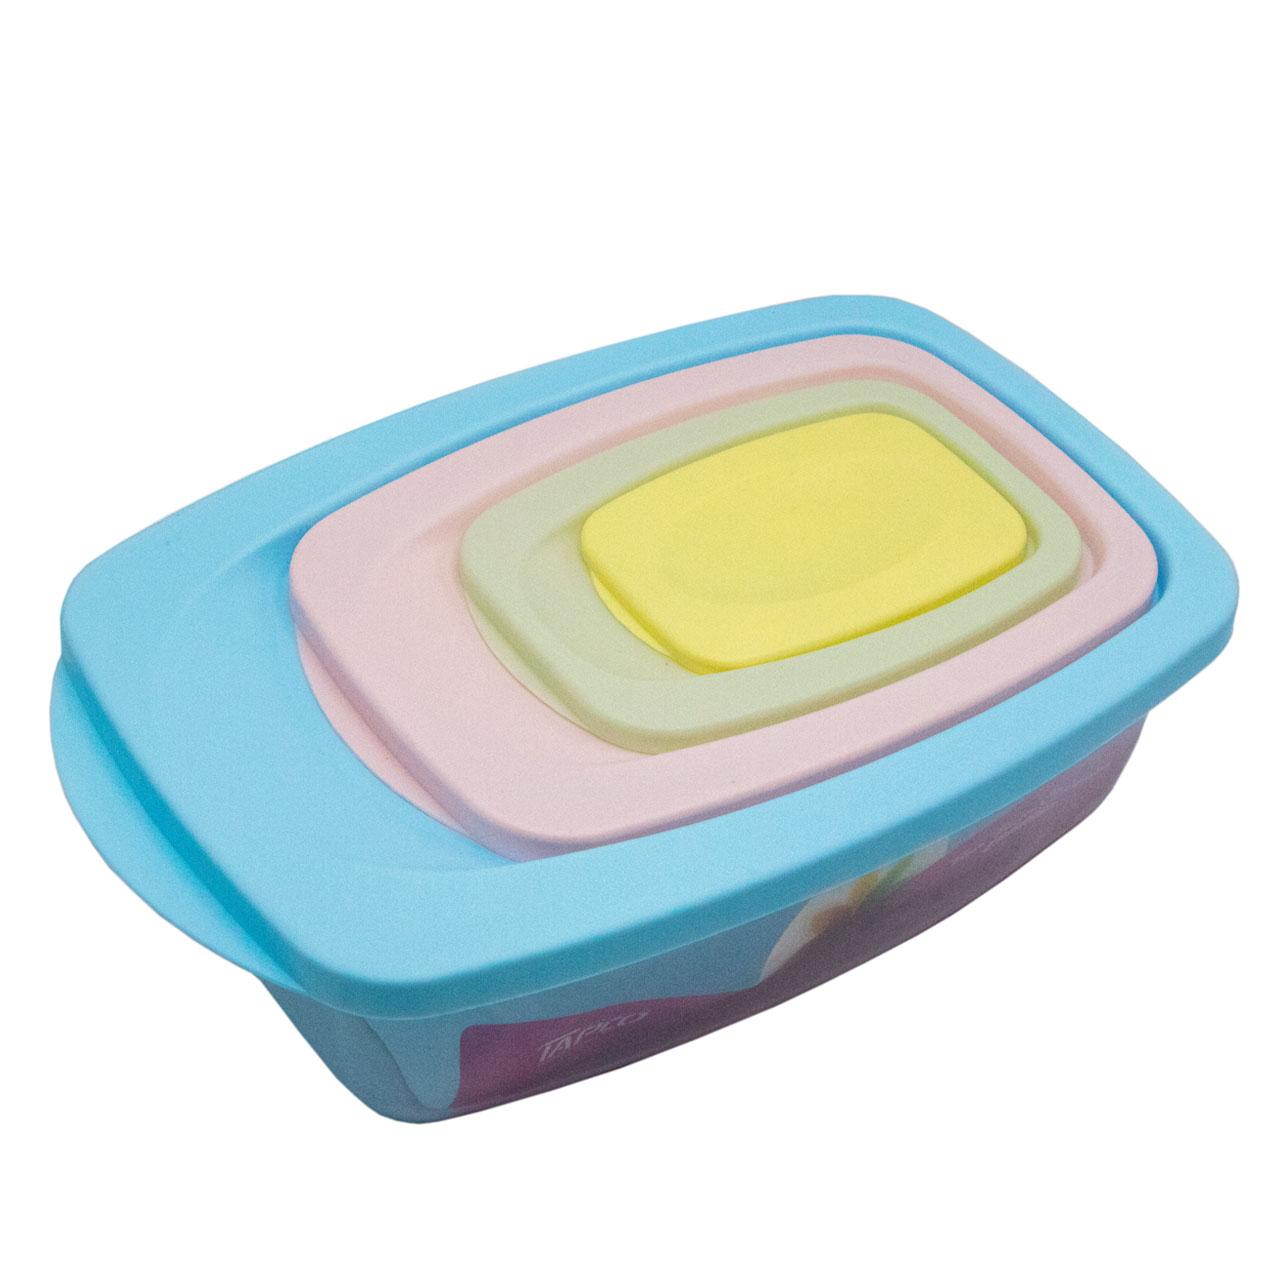 ظروف پلاستیکی تاپکو مدل فلورا کد A1002 مجموعه 4 عددی